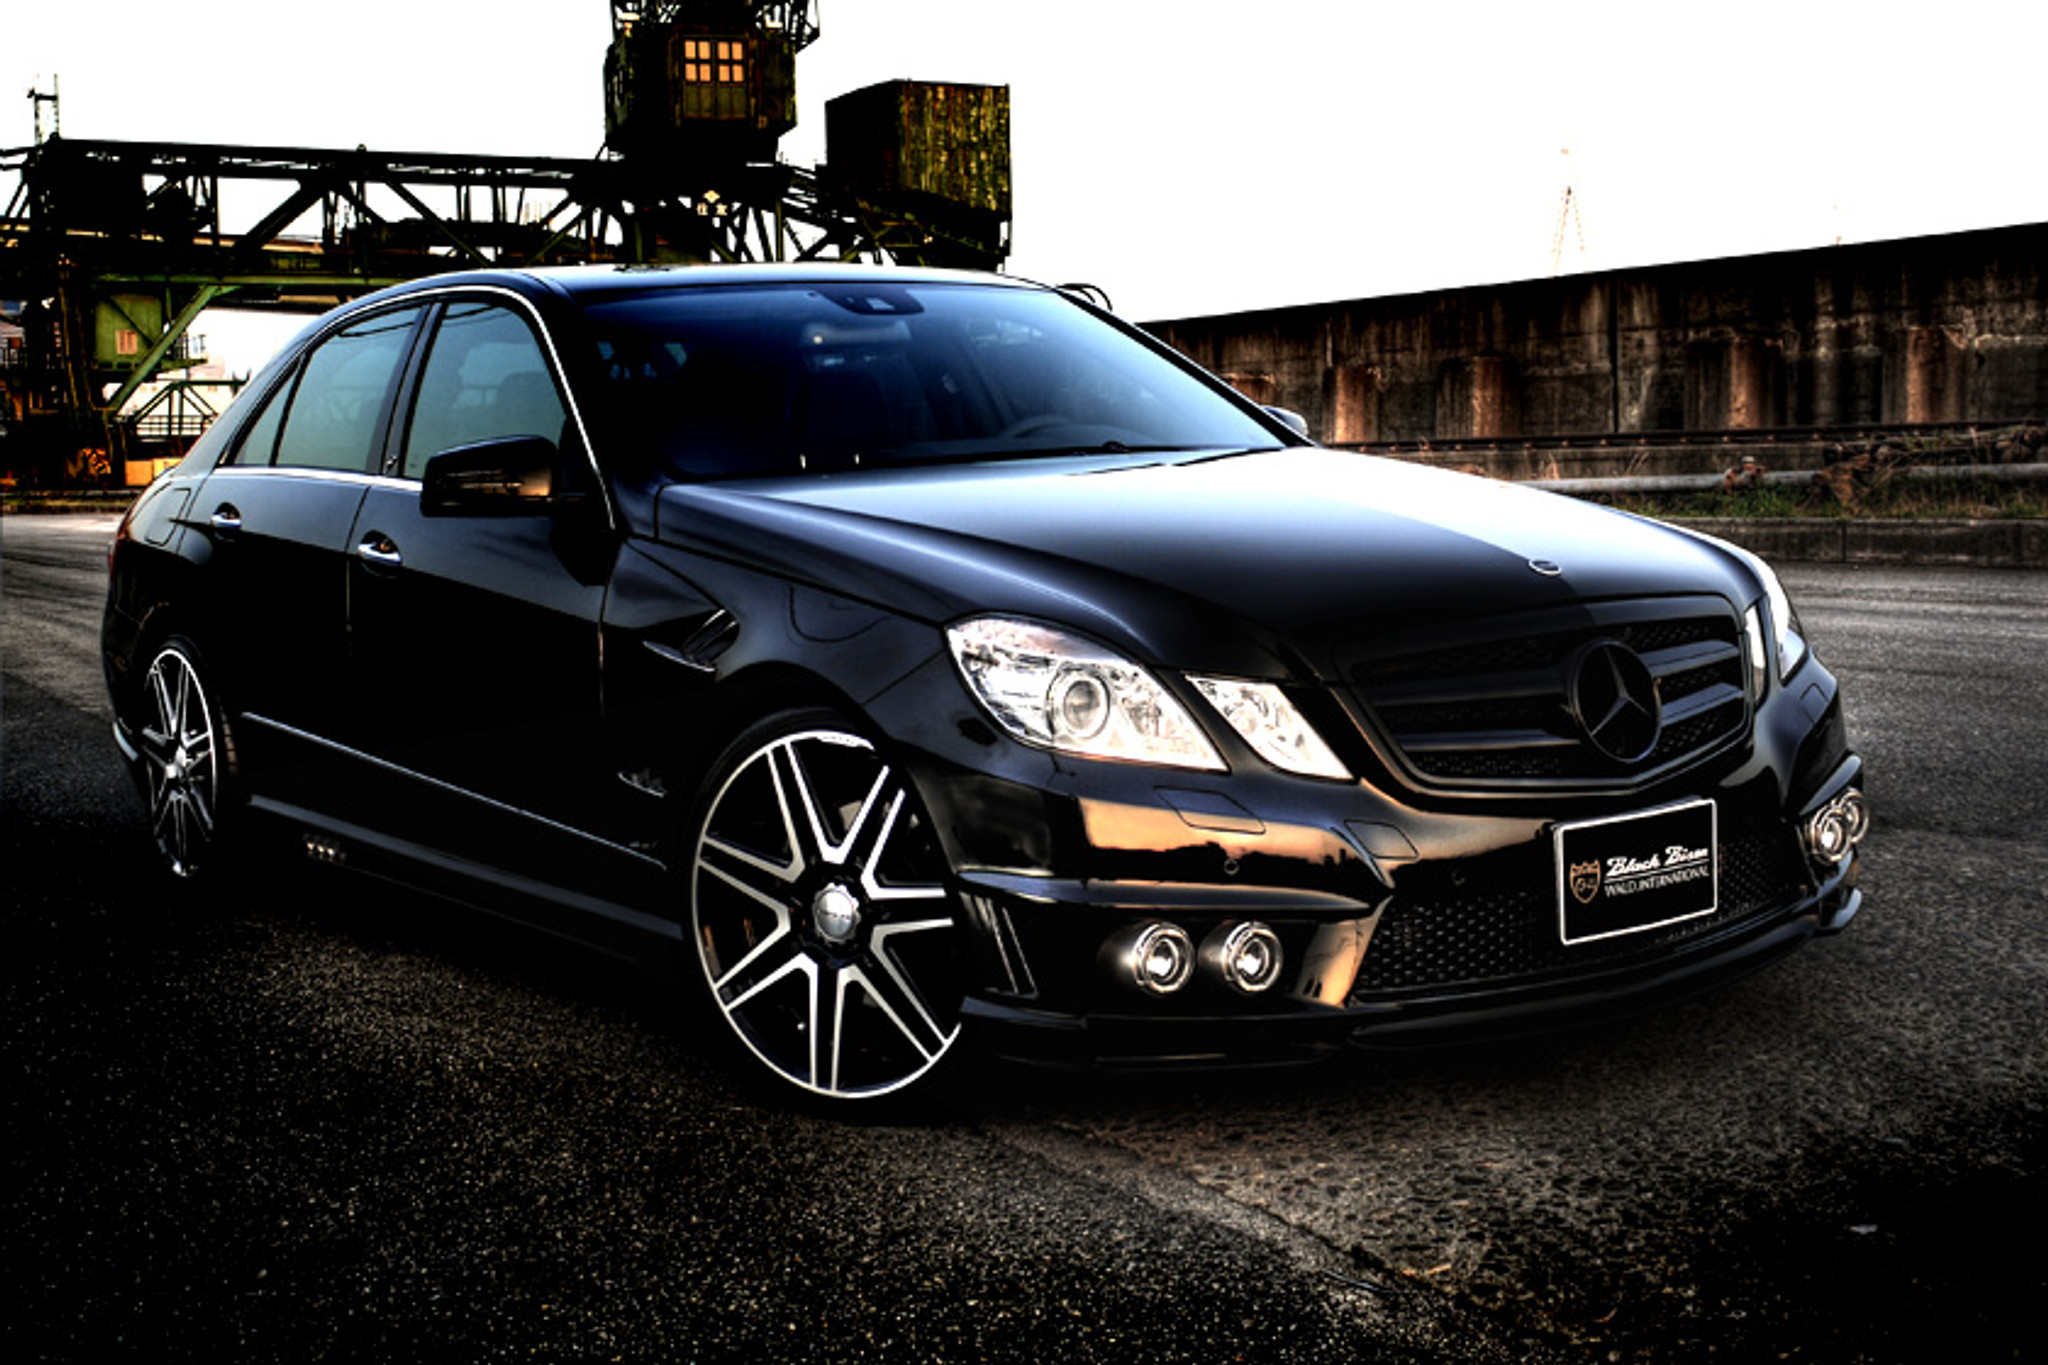 Mercedes E-Class W212 Sports Line Black Bison Edition Wald International Body Kit - Meduza ...